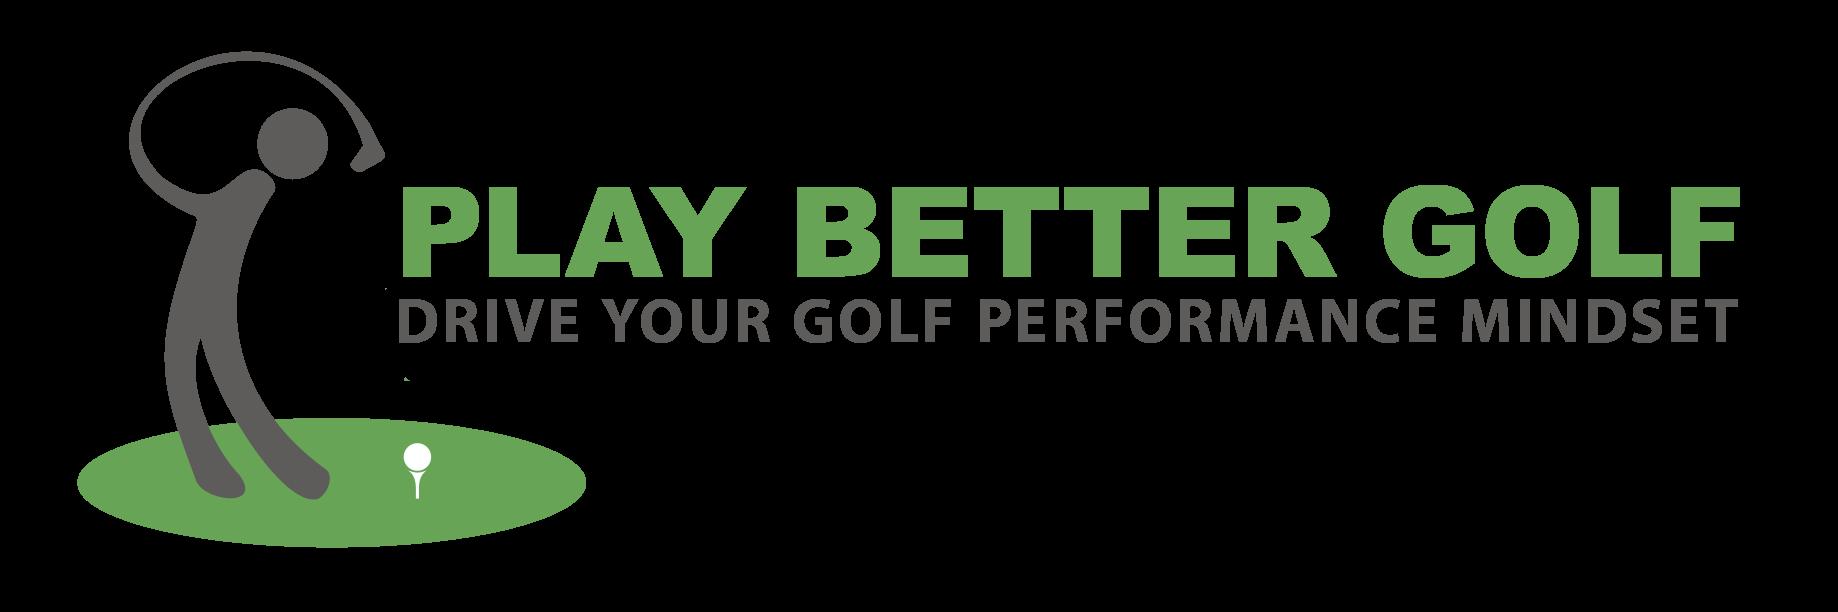 Play Better Golf Bigger Border